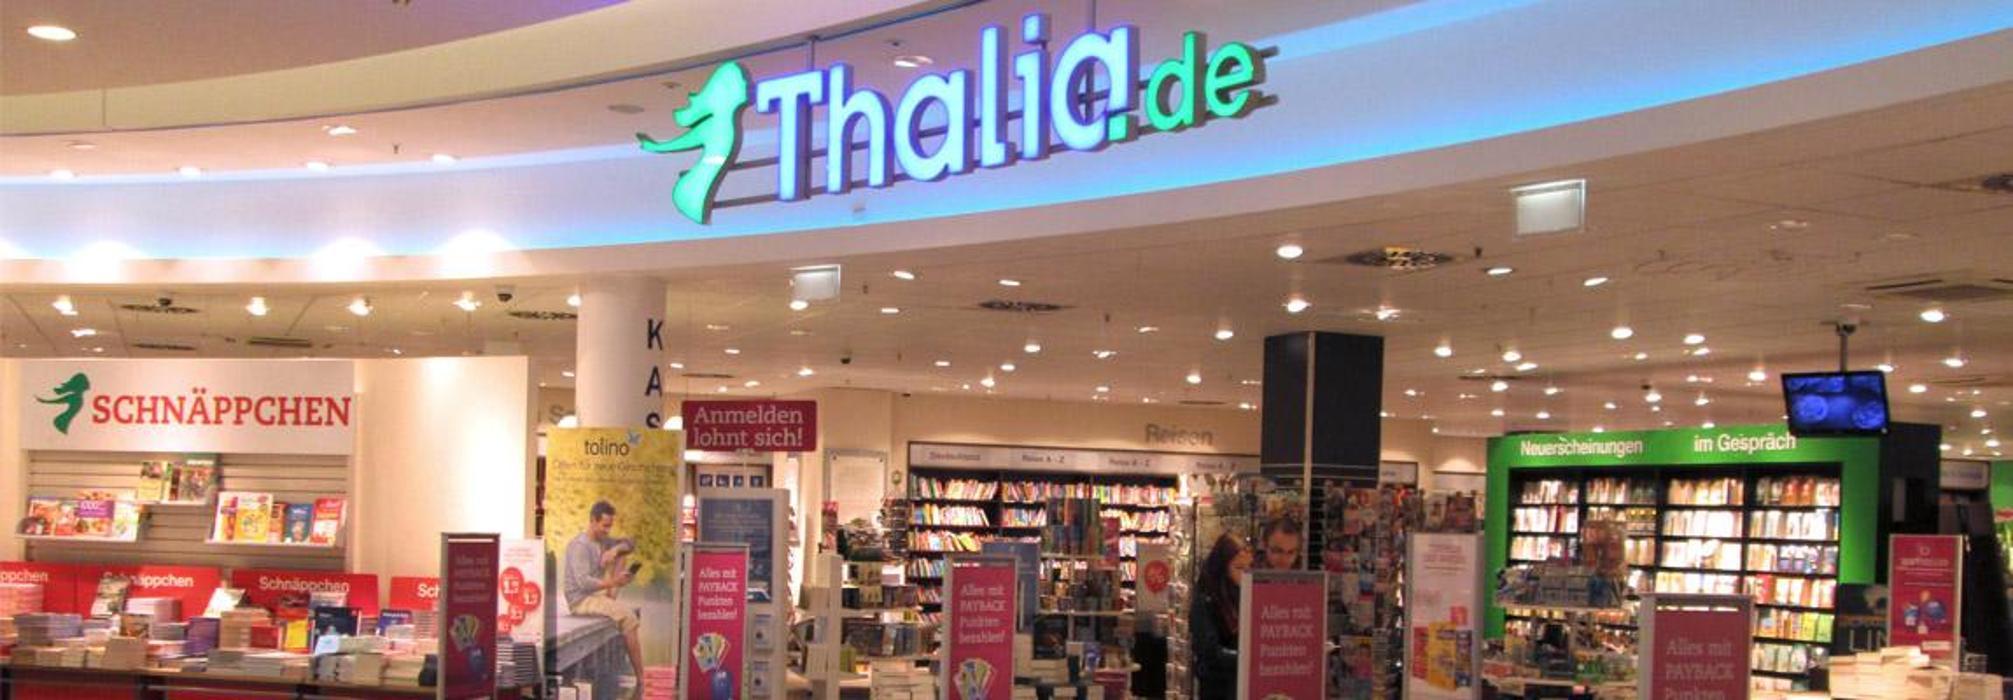 Thalia Dortmund - Thier-Galerie, Westenhellweg in Dortmund